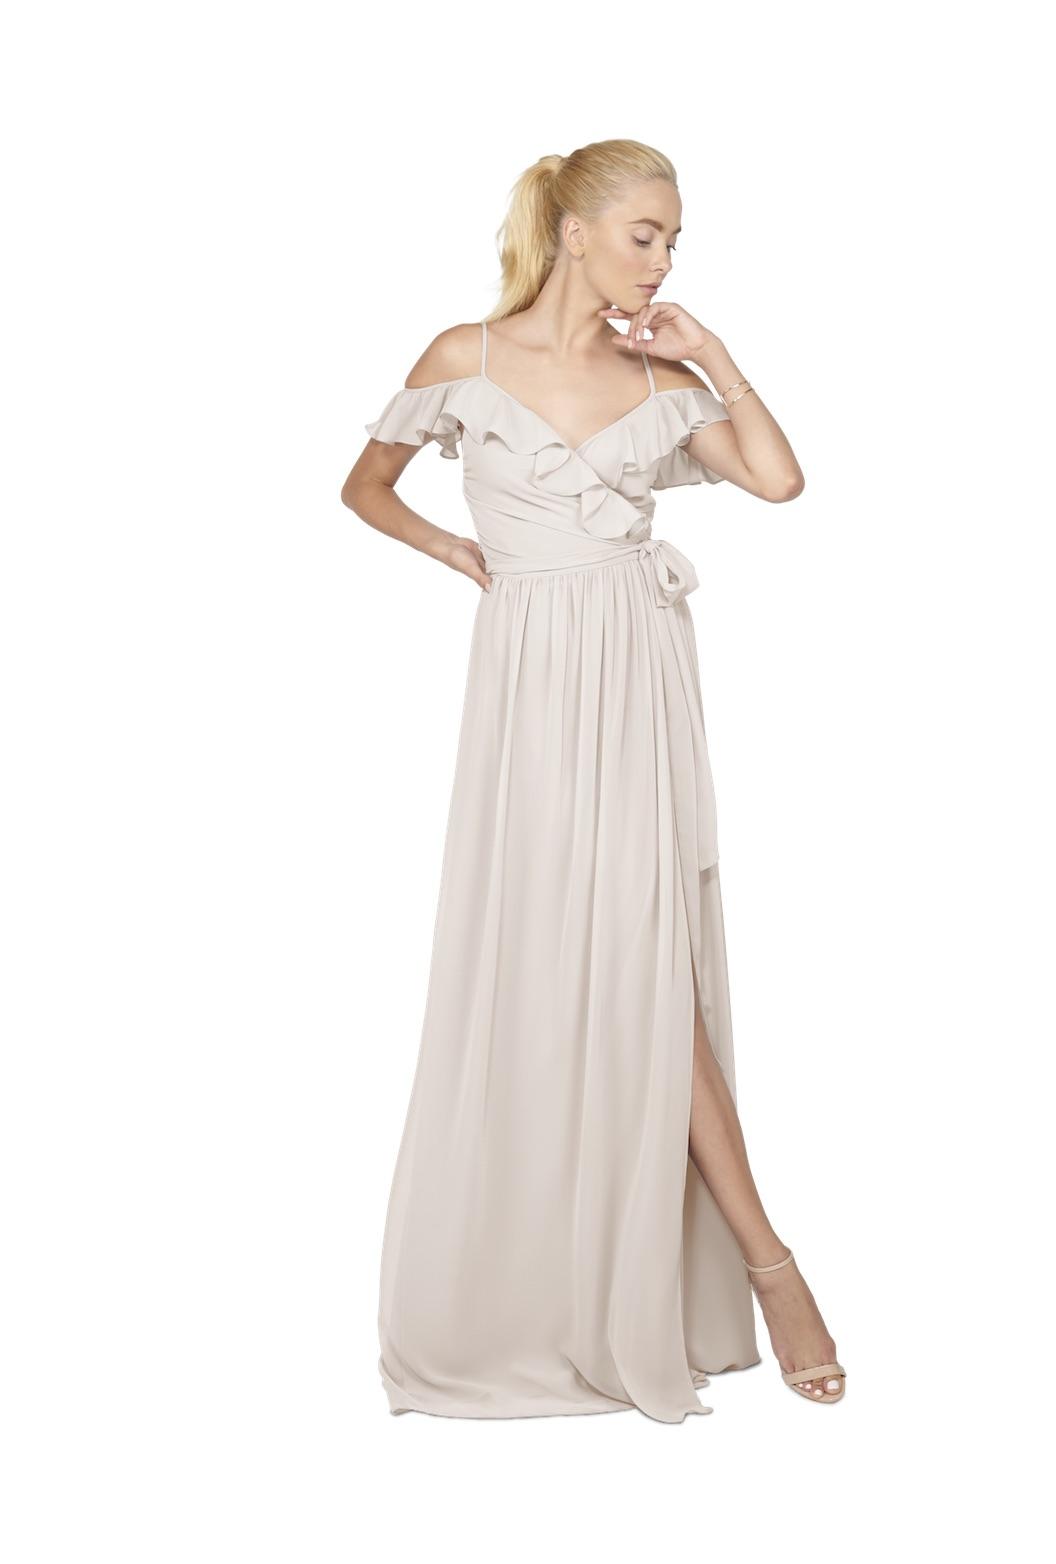 ivory-and-beau-bridal-boutique-savannah-wedding-dress-savannah-wedding-gown-savannah-bridal-boutique-savannah-bridal-shop-savannah-wedding-planner-rodan-and-fields-joanna-august-bridesmaids-portia-long-chiffon.jpg